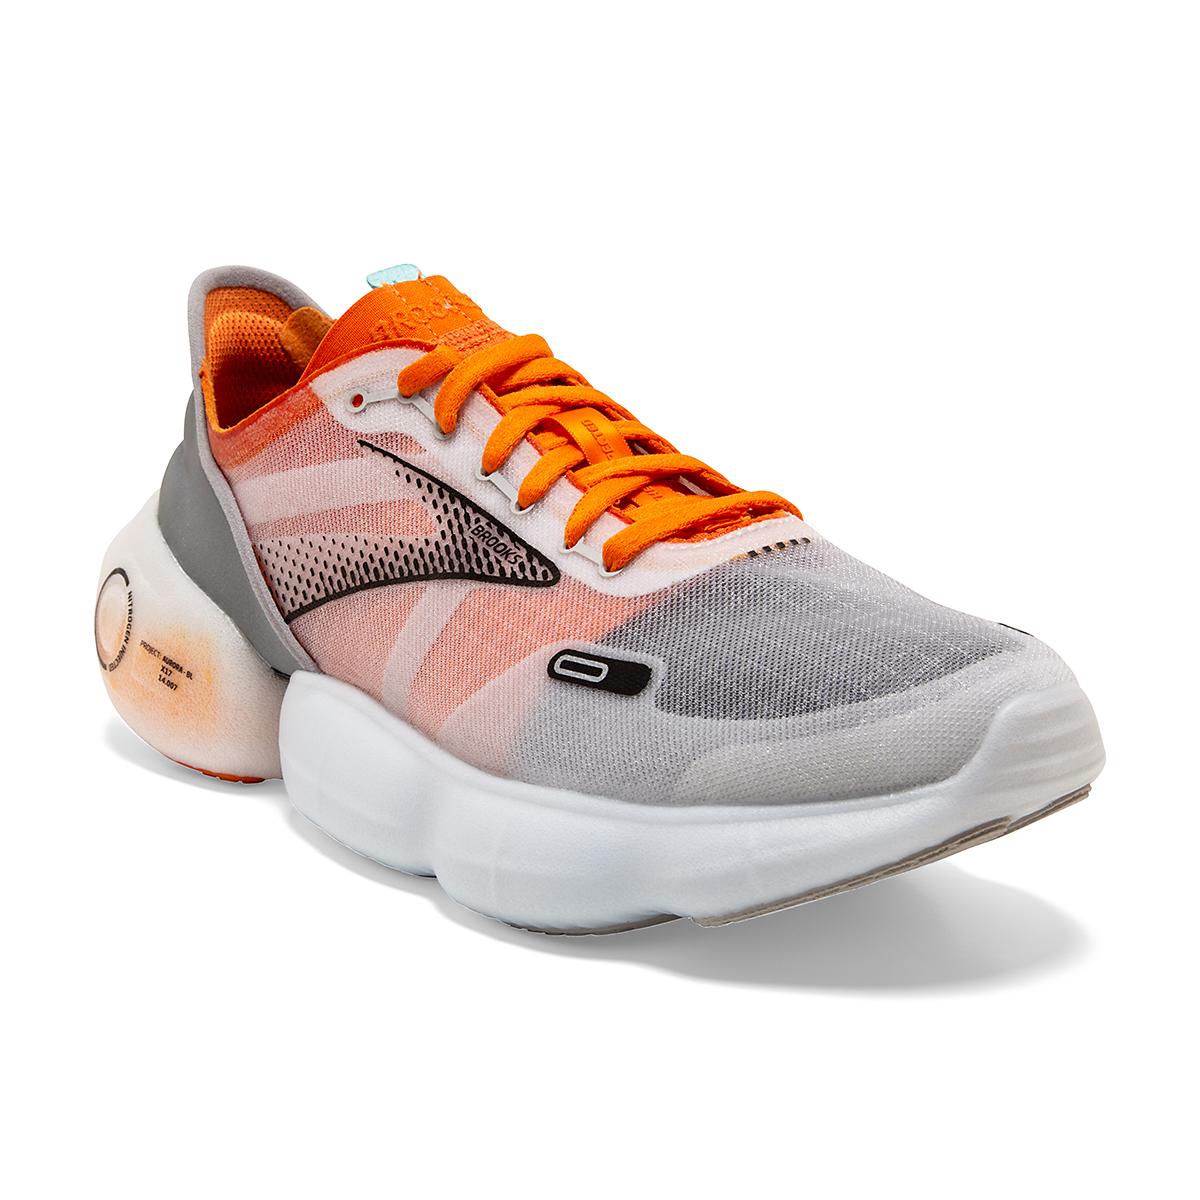 Men's Brooks Aurora-BL Running Shoe - Color: Persimmon/Antarctica - Size: 7 - Width: Regular, Persimmon/Antarctica, large, image 3